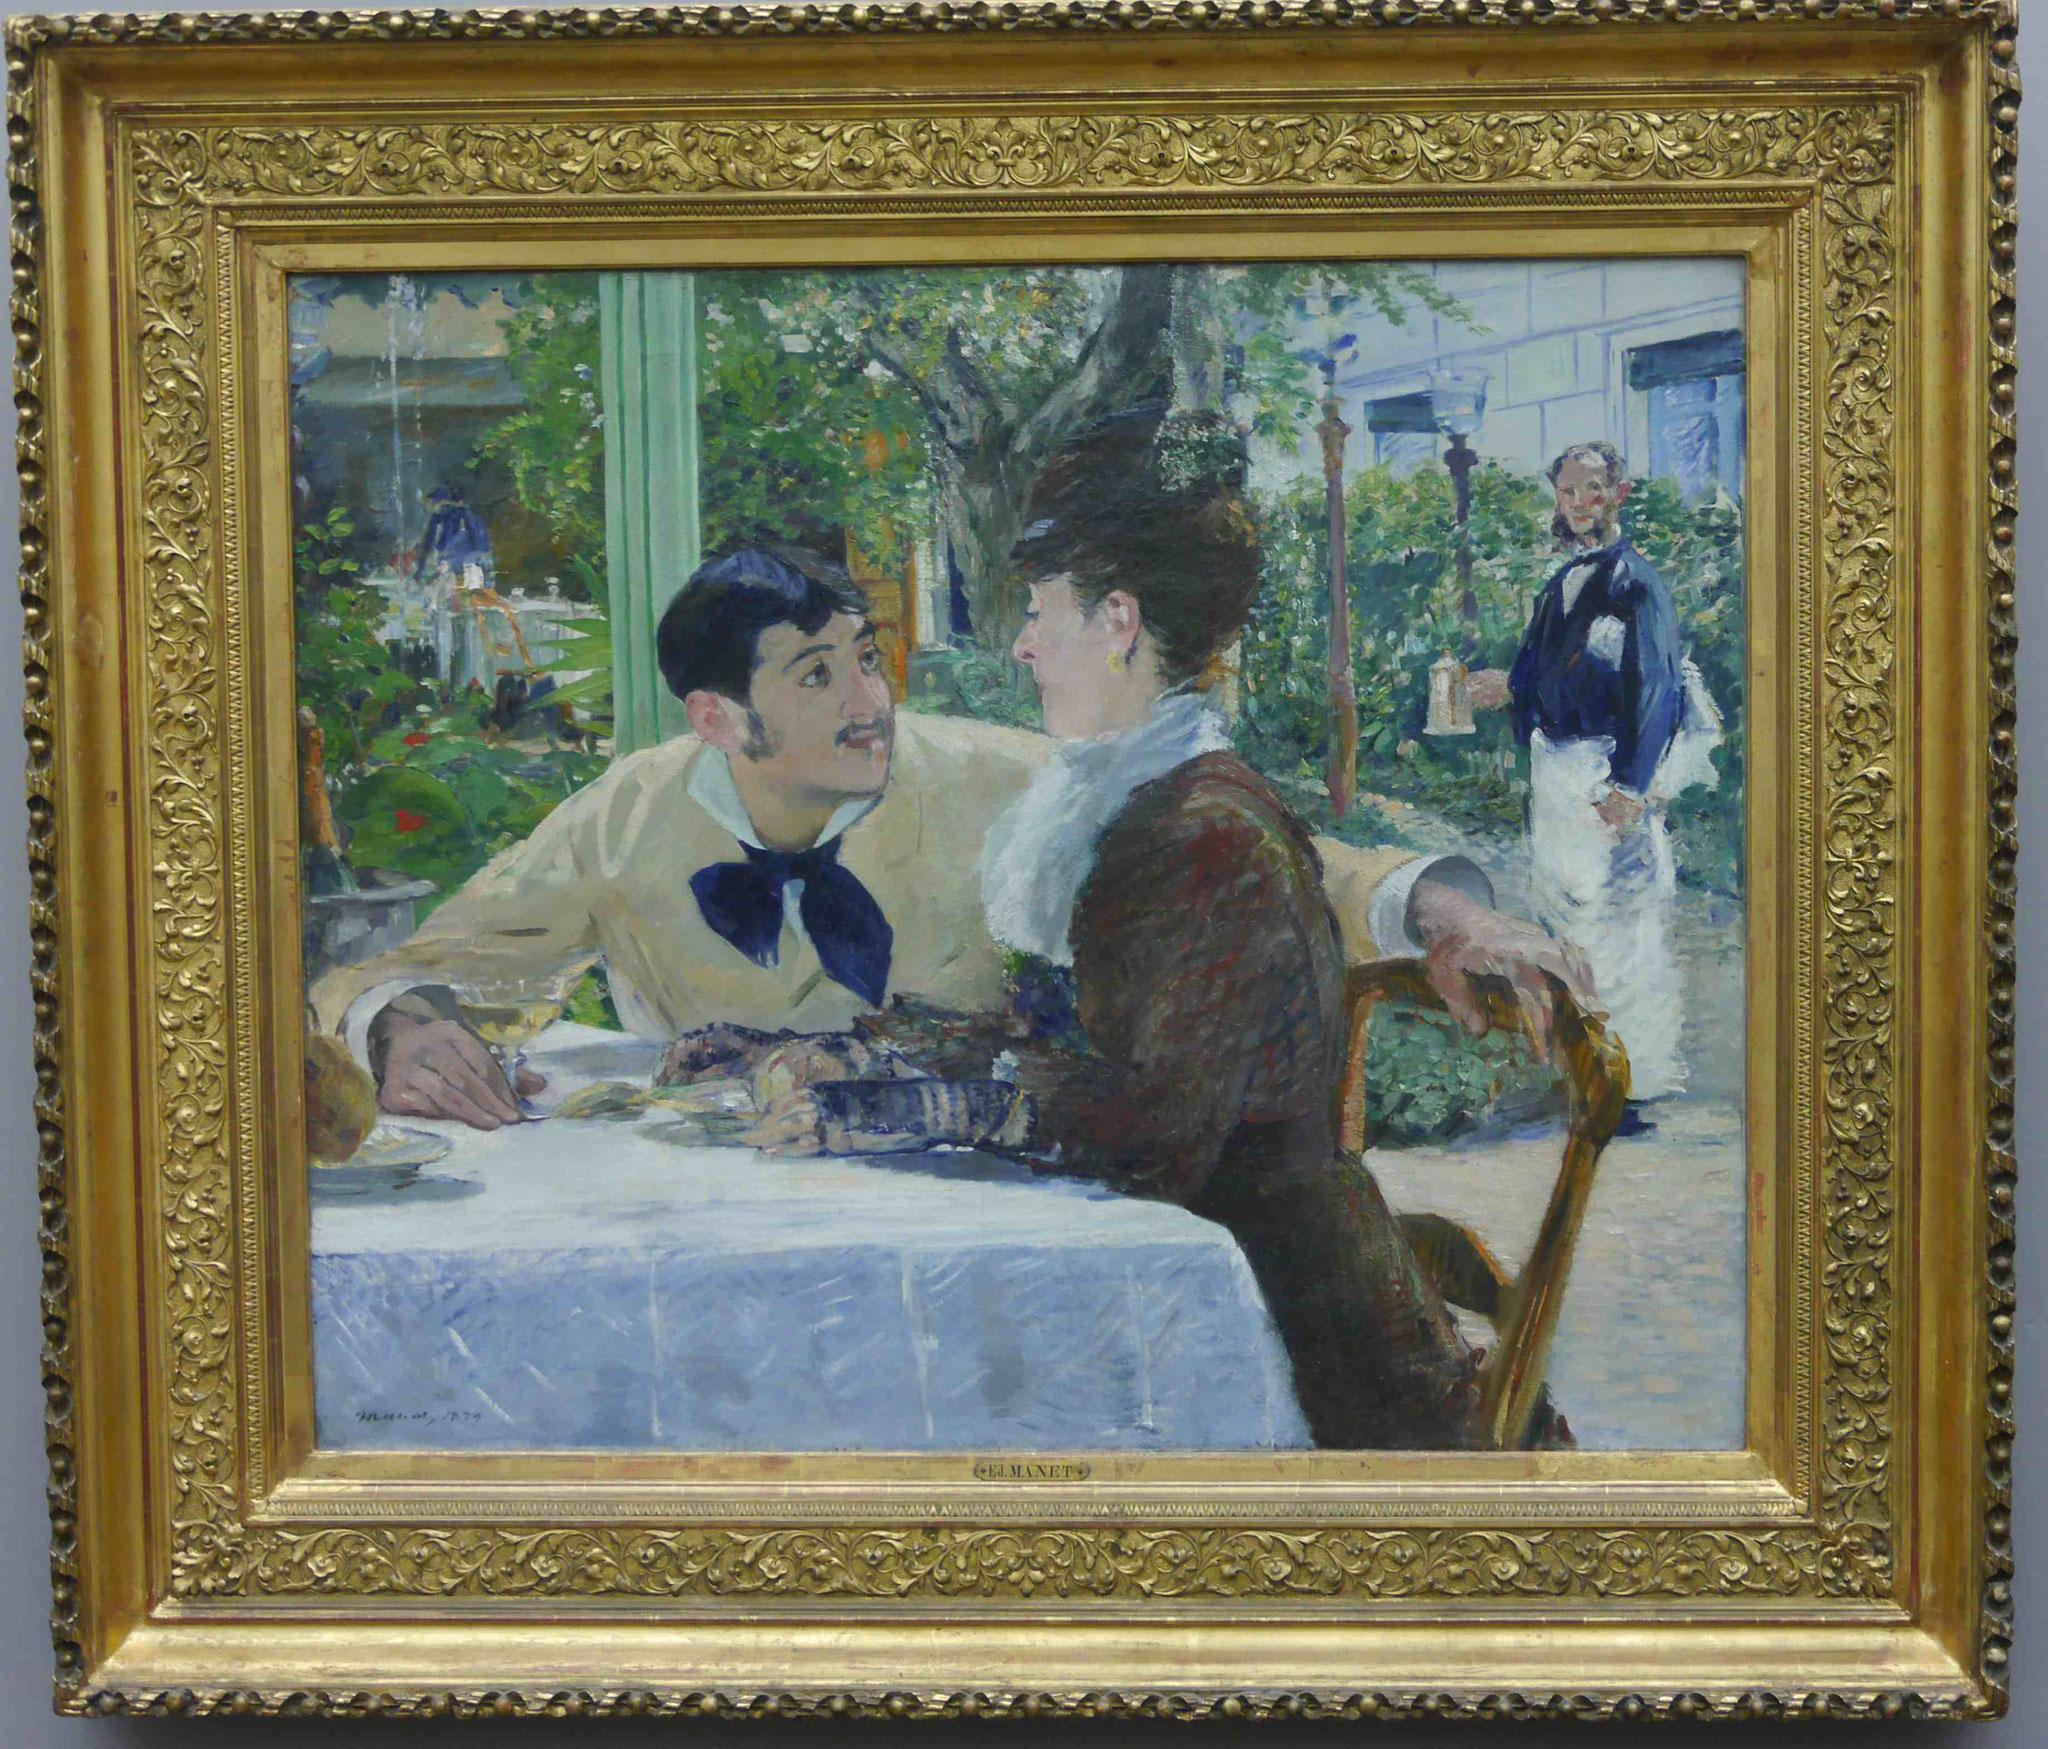 Edouard Manet, ImEx, Musée des Beaus Art de Tournai